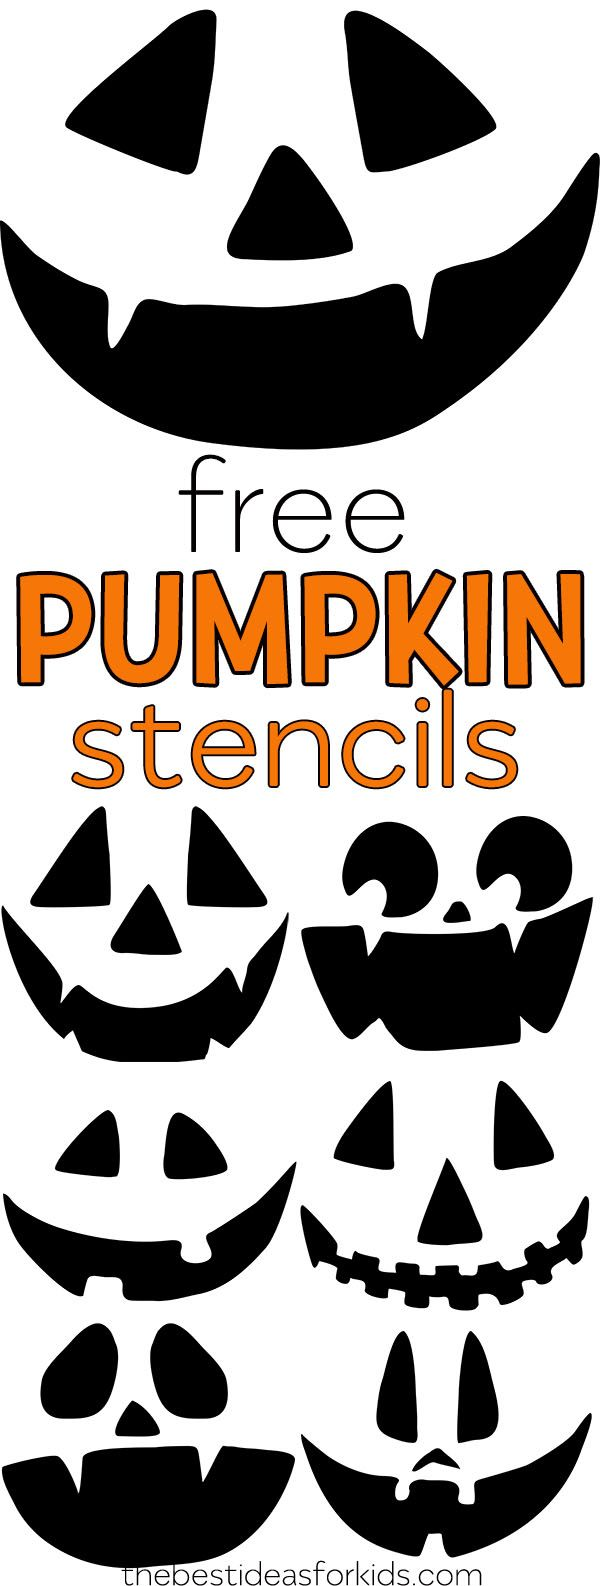 Free Pumpkin Carving Stencils - The Best Ideas for Kids